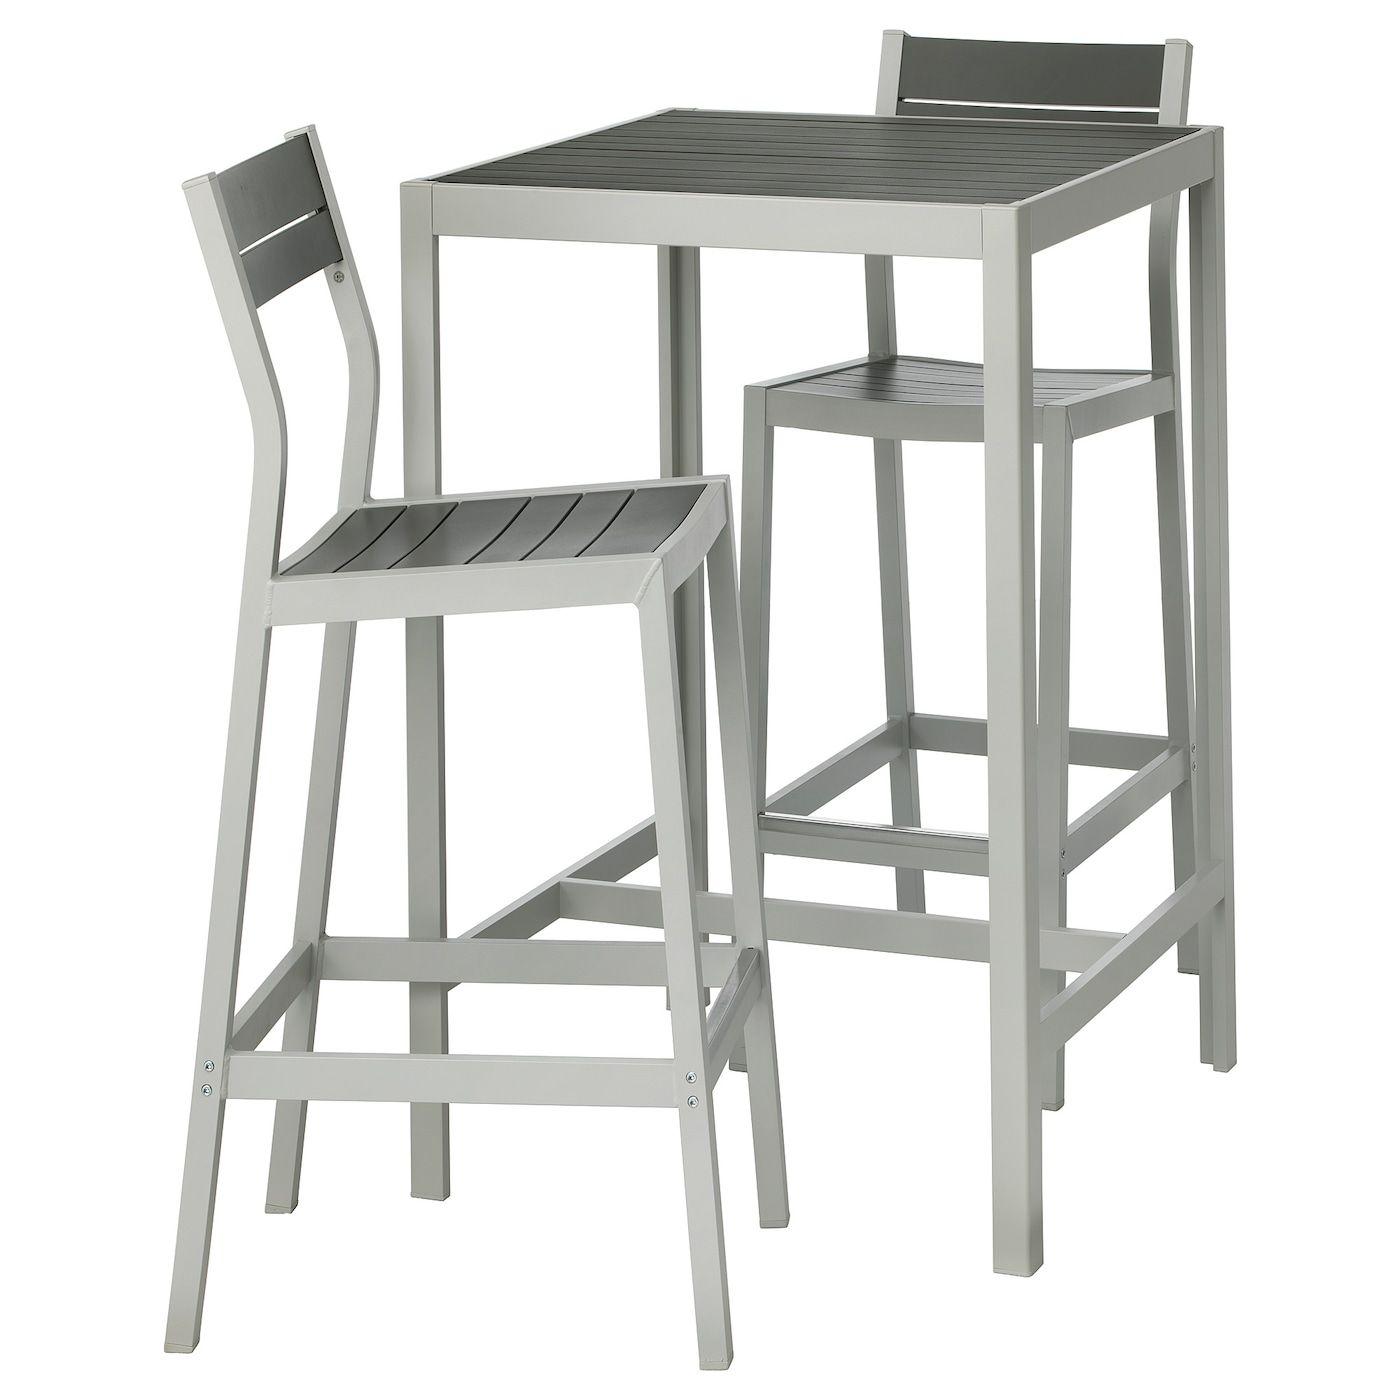 Ikea Tavolo E 2 Sgabelli Bar Da Esterno In 2020 Bartisch Barstuhle Stuhlpolster